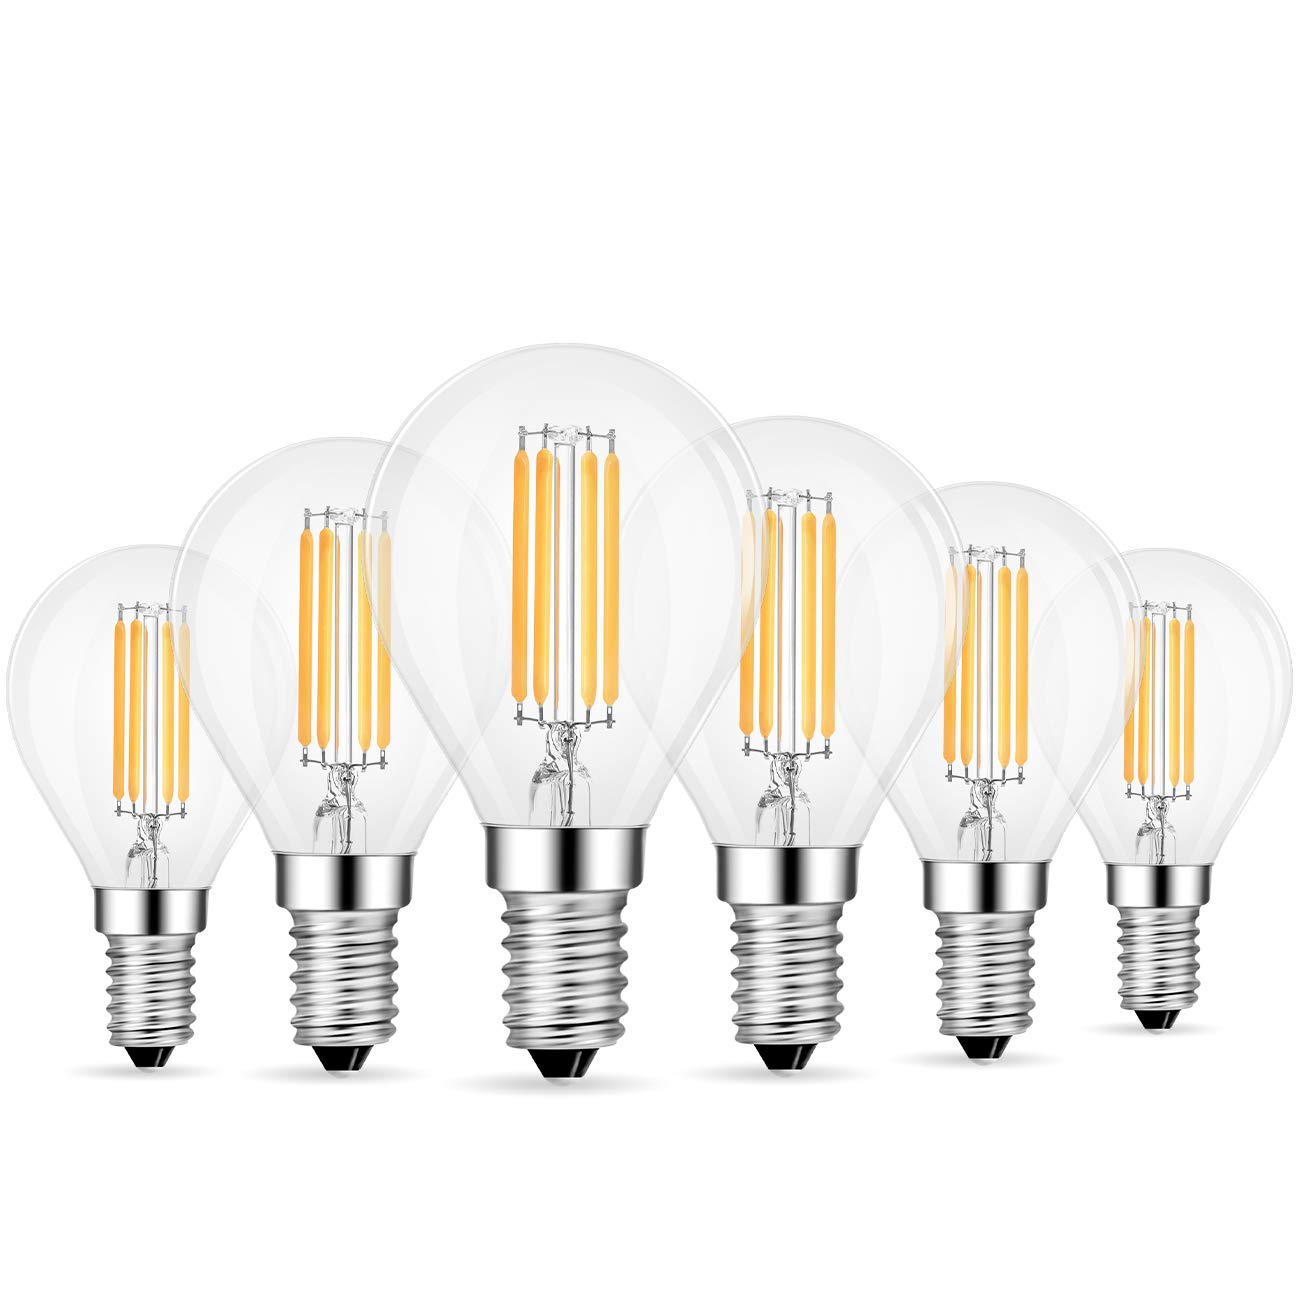 ANWIO G14 Dimmable LED Filament Bulb 4W(40W Equivalent), 3000K Soft White, E12 Screw Base LED Globe Bulb, Pack of 6